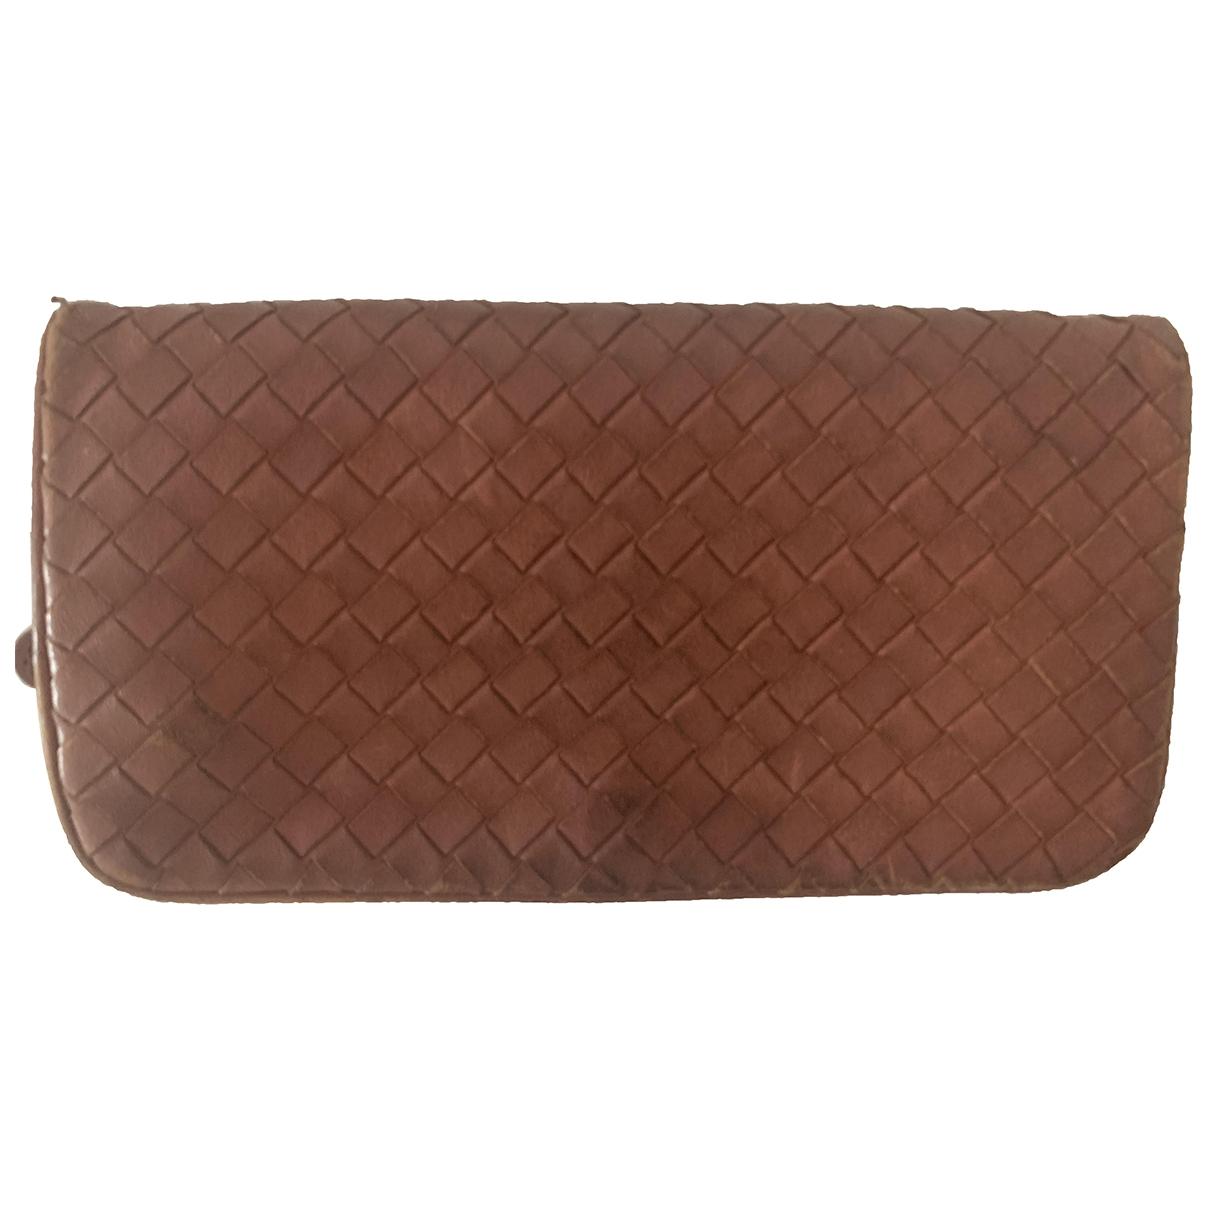 Bottega Veneta Intrecciato Leather wallet for Women \N